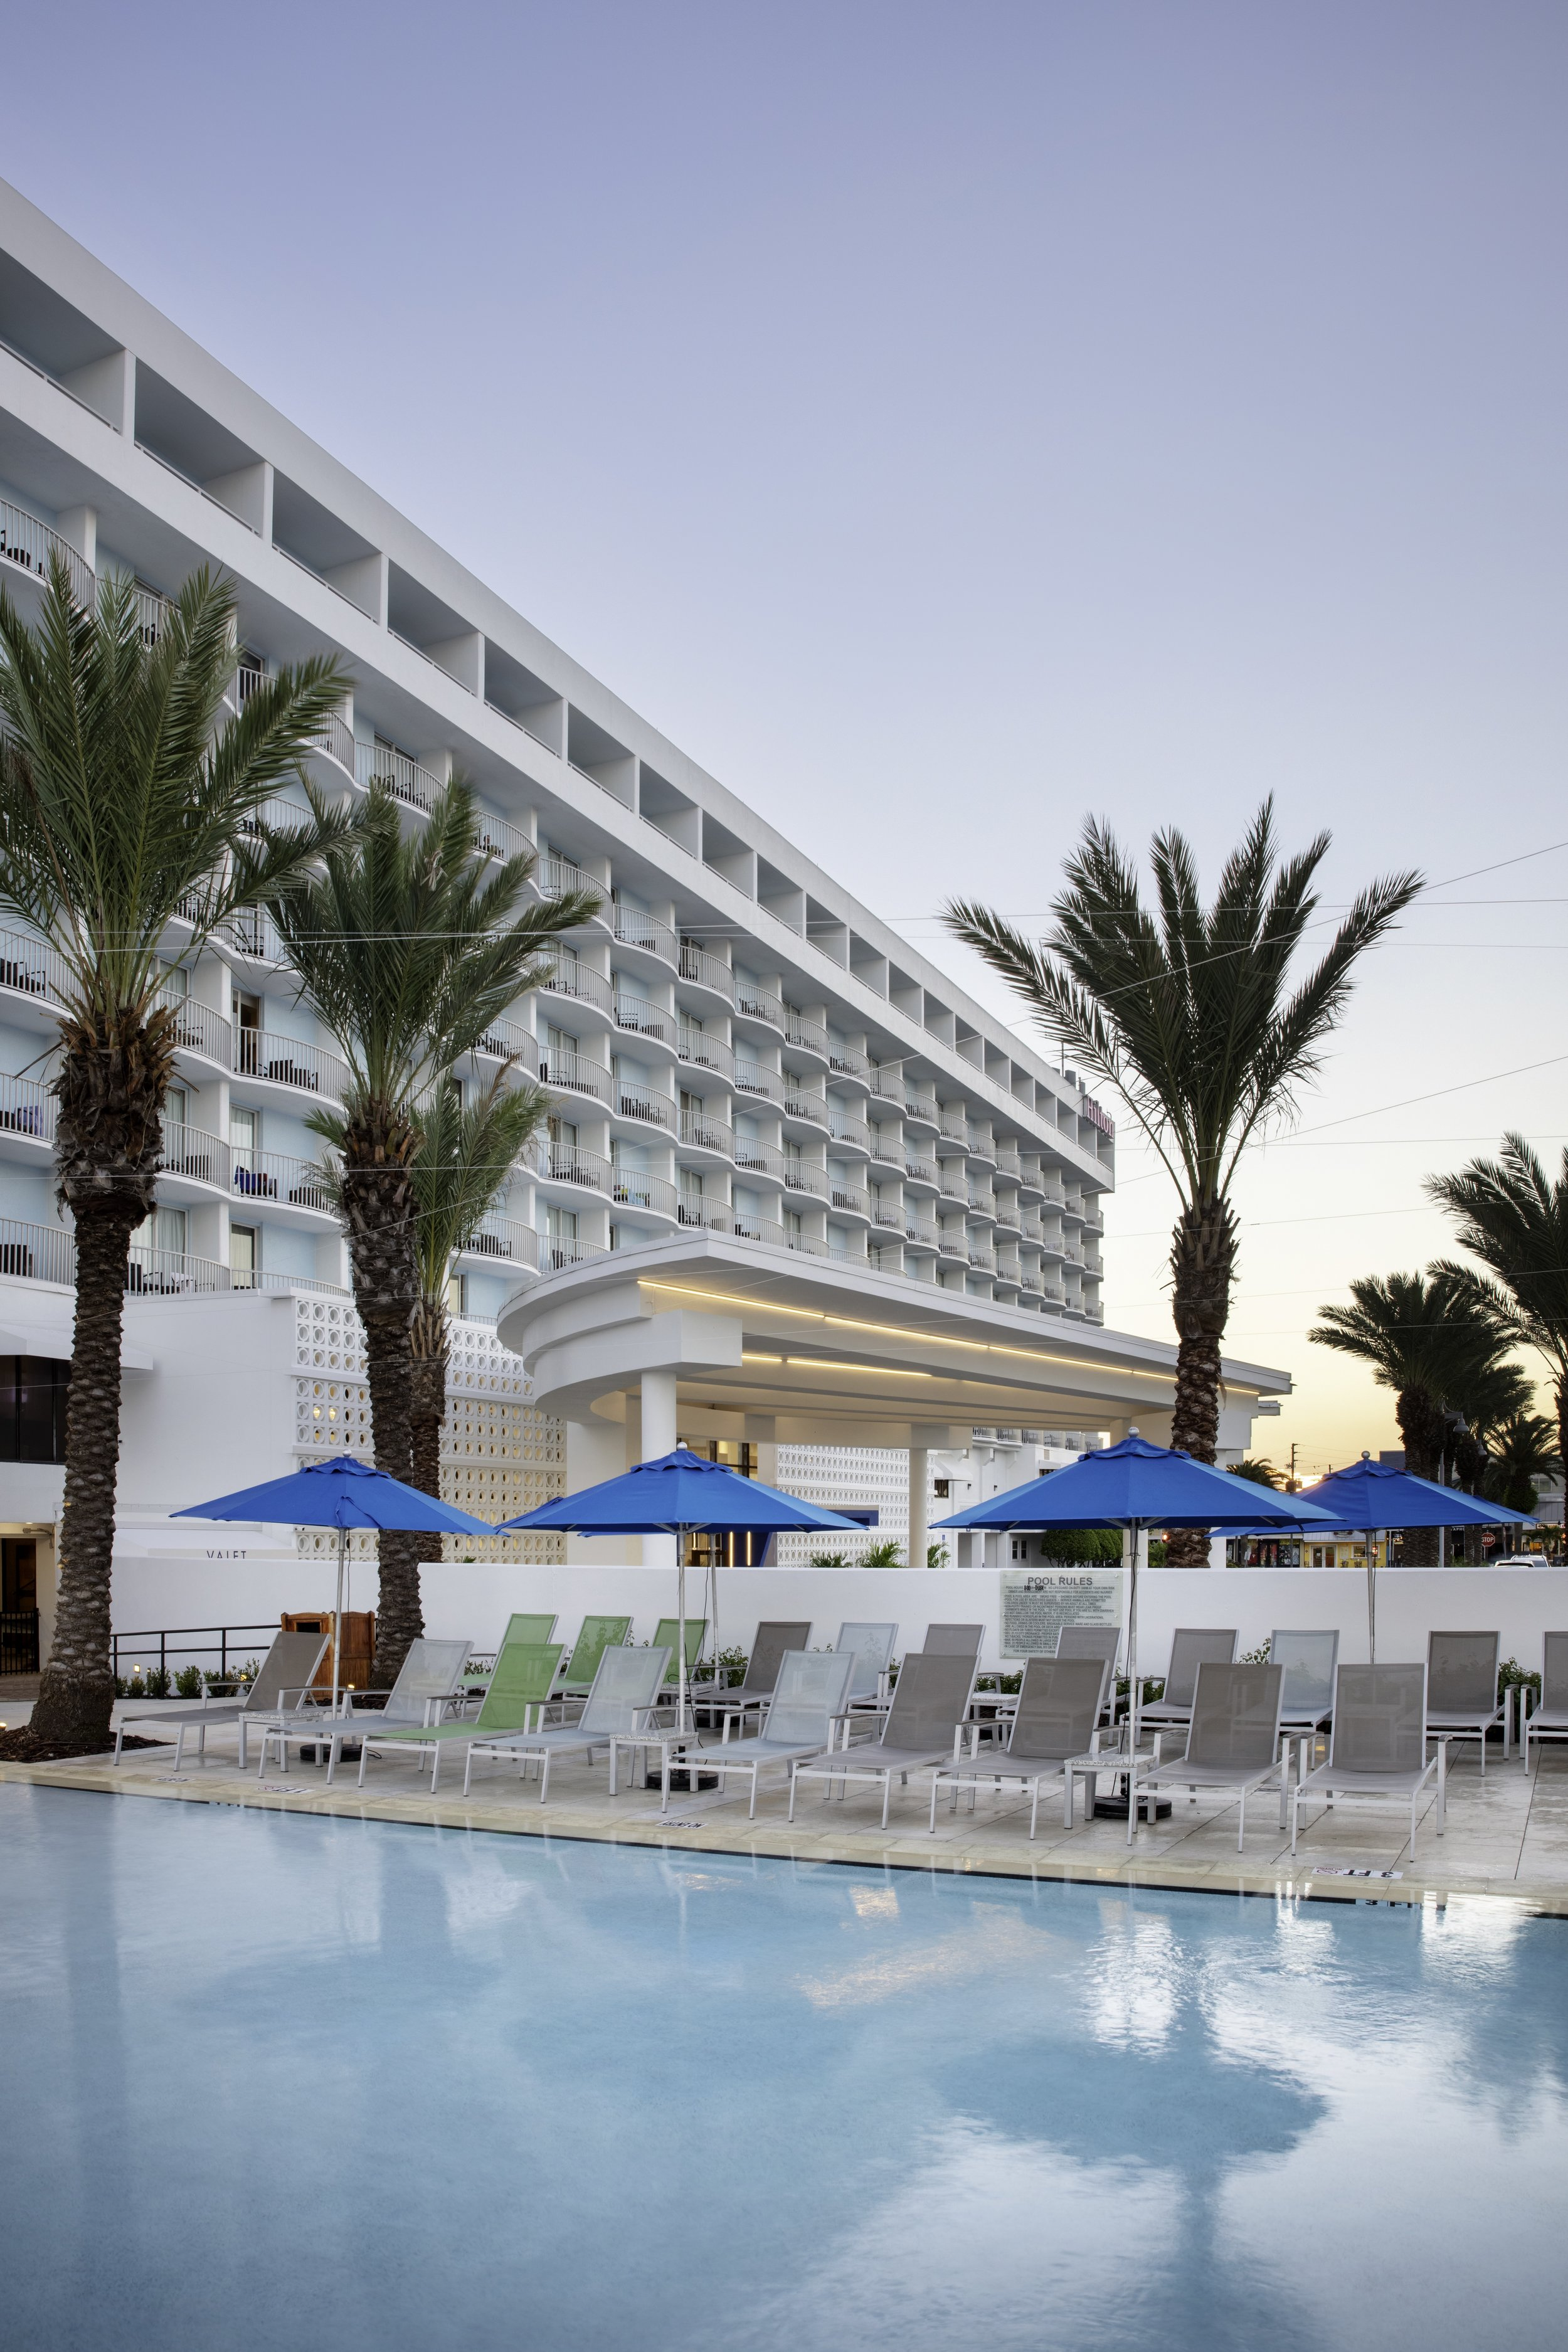 Hilton Clearwater Beach Resort & Spa -